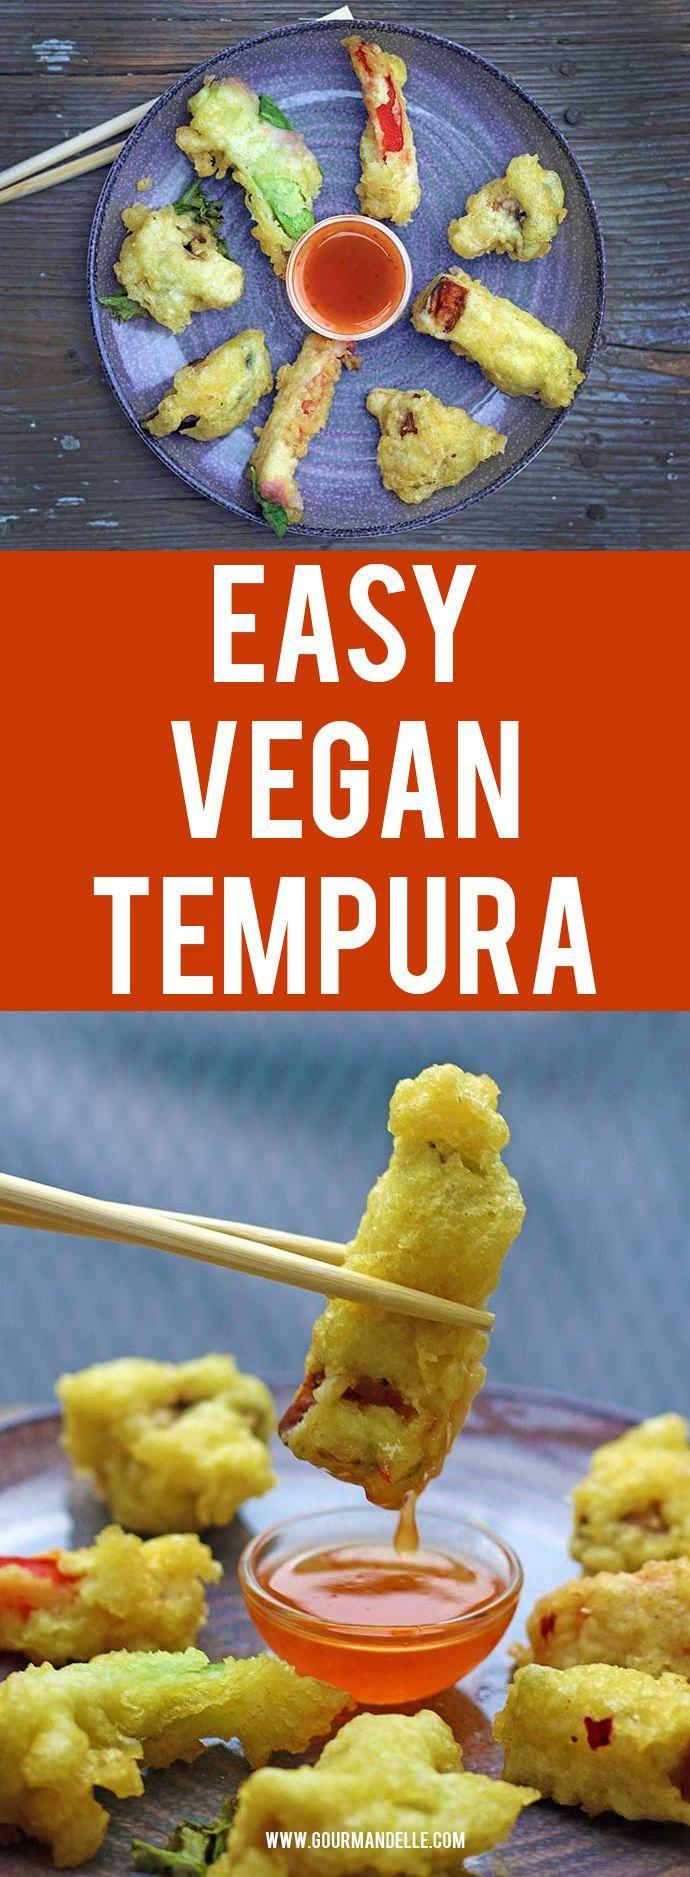 Easy Vegetarian Tempura   Do you want to know how to make vegetarian tempura? Here's an easy recipe for making crispy and delicious vegan tempura. #japanese #tempura #veganrecipes